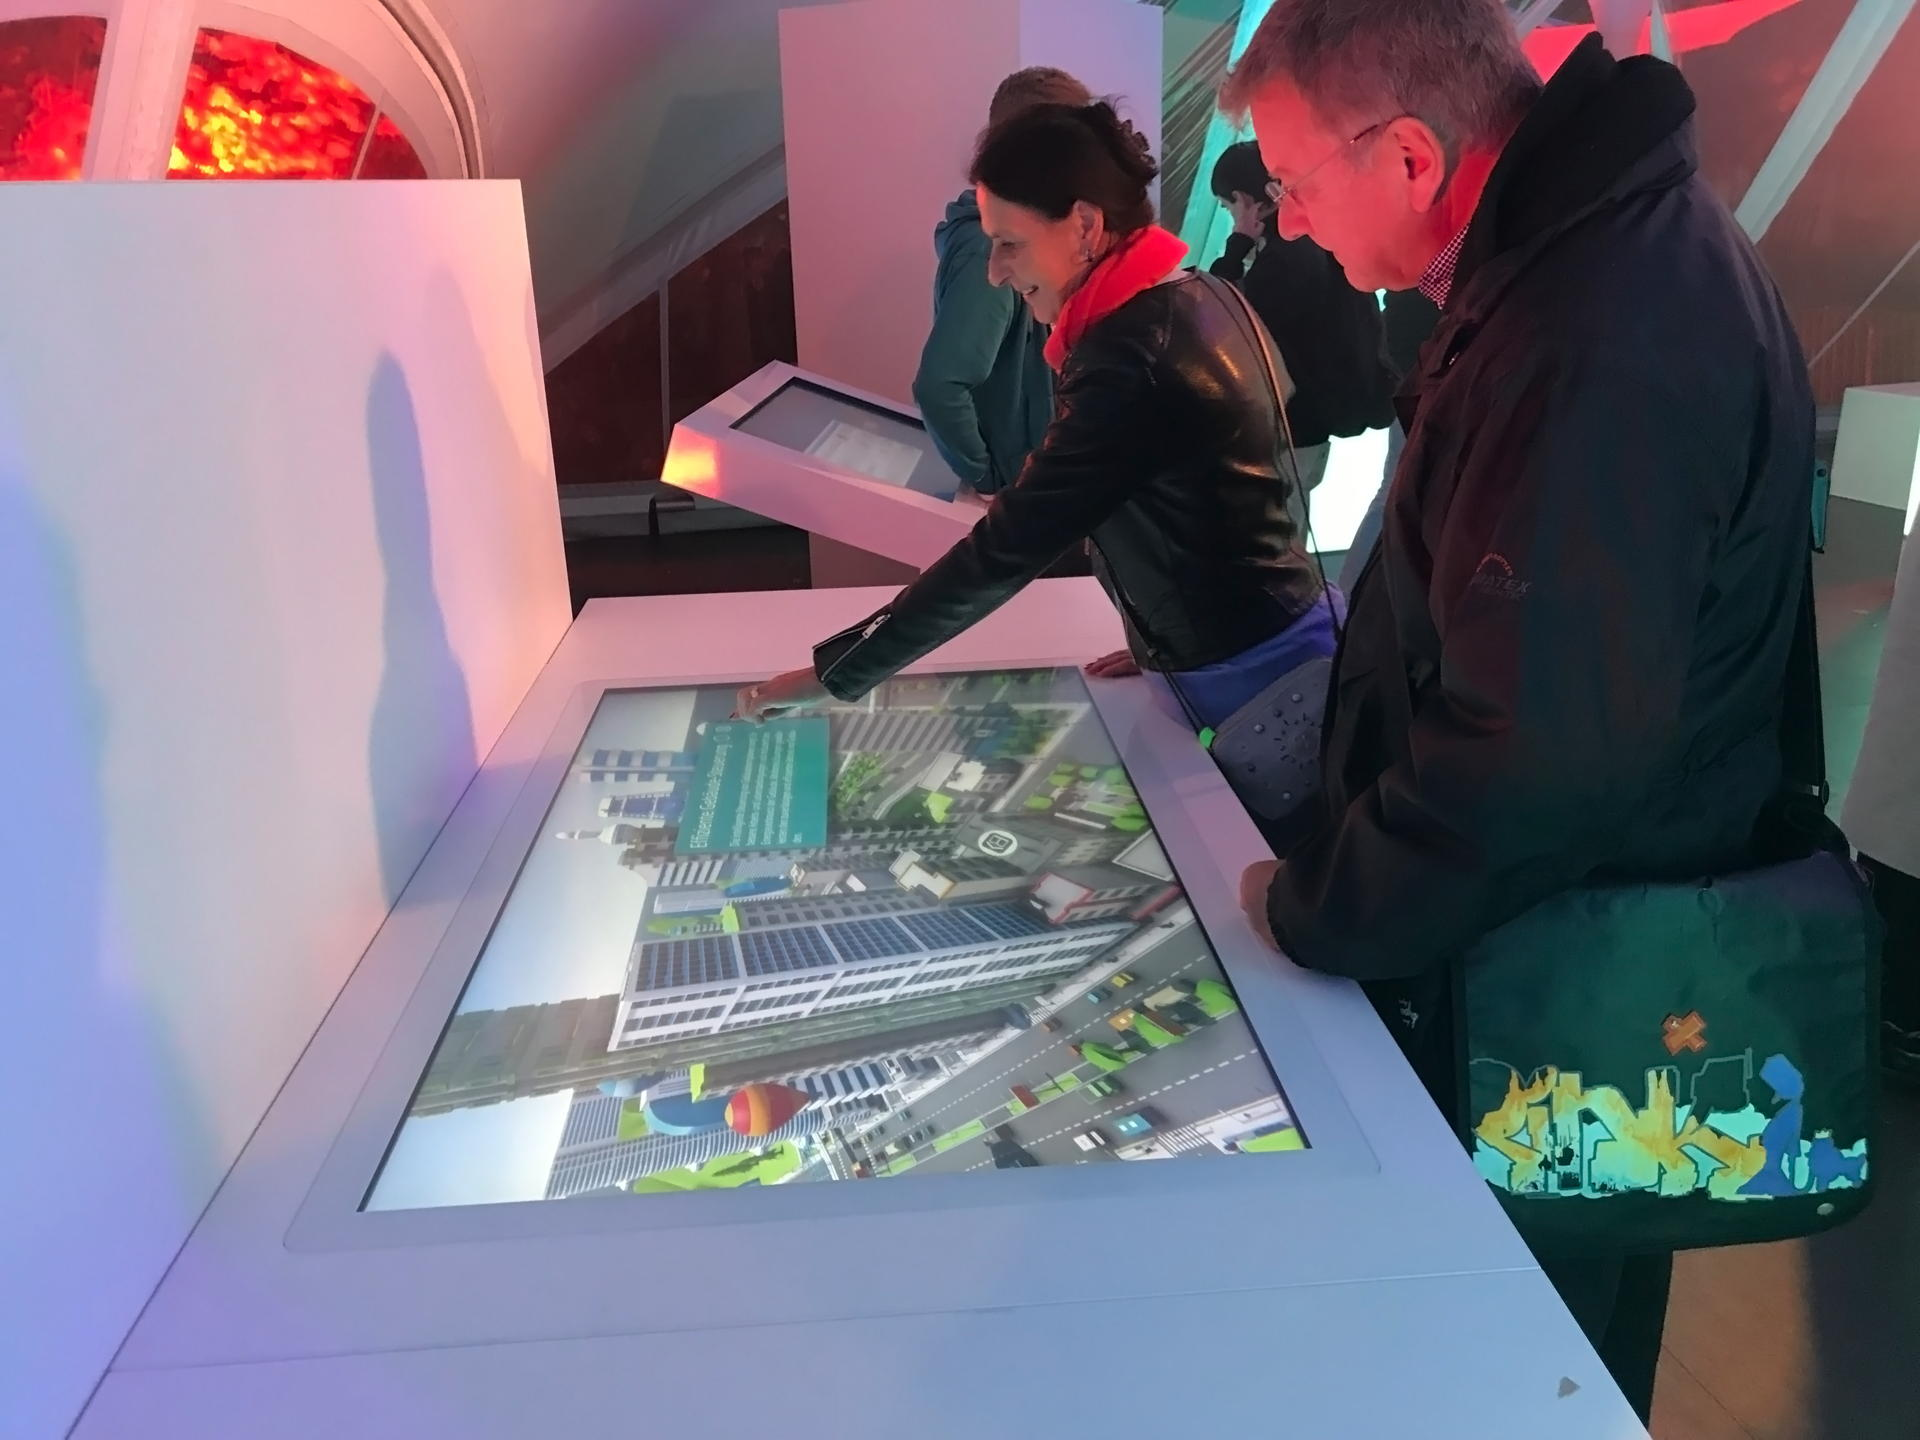 Stadt_der_Zukunft_pong_li_3